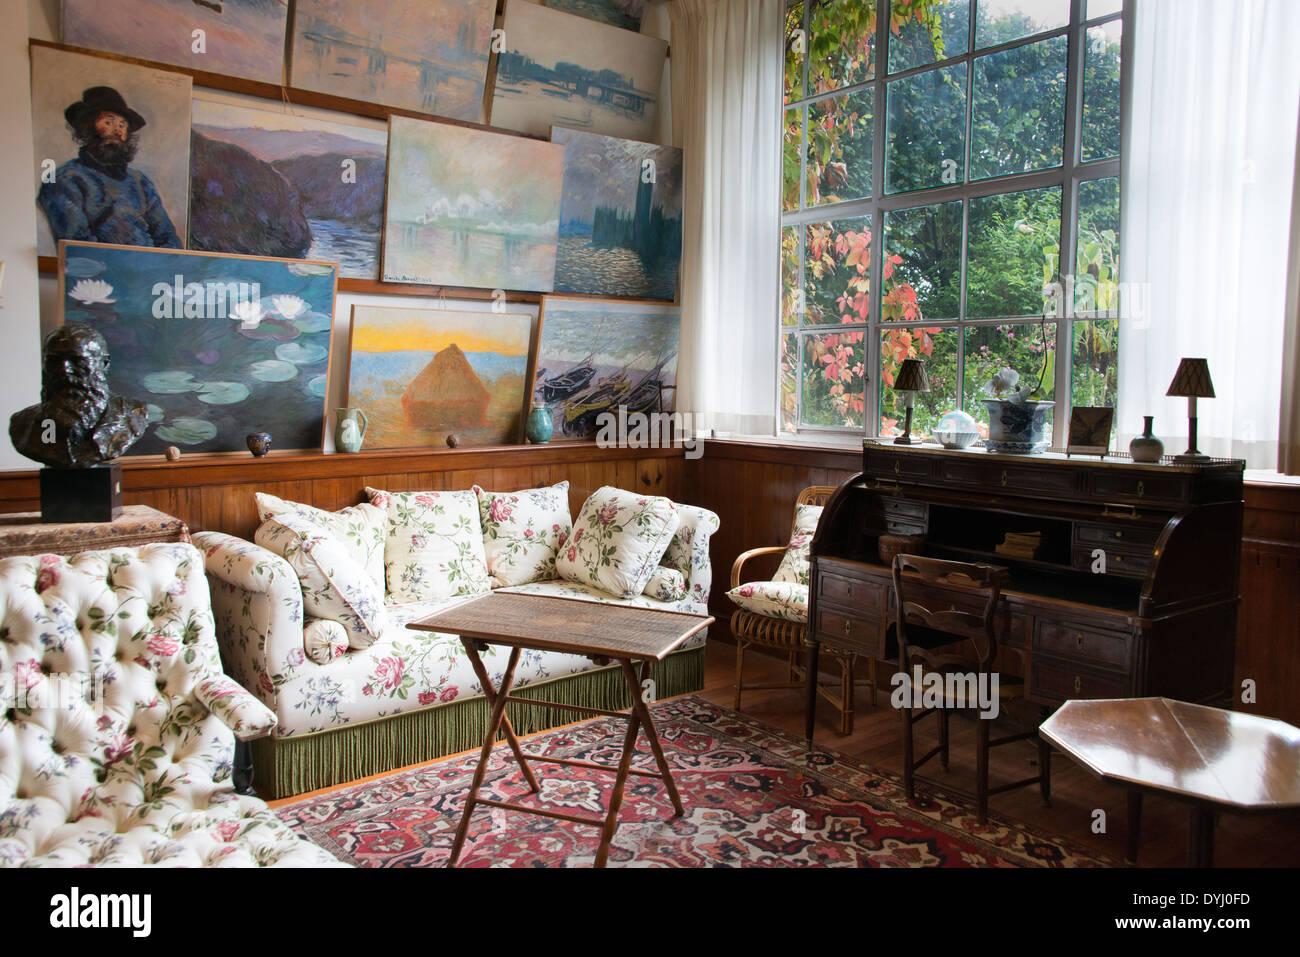 Monet House Interior Stock Photos & Monet House Interior Stock ... on